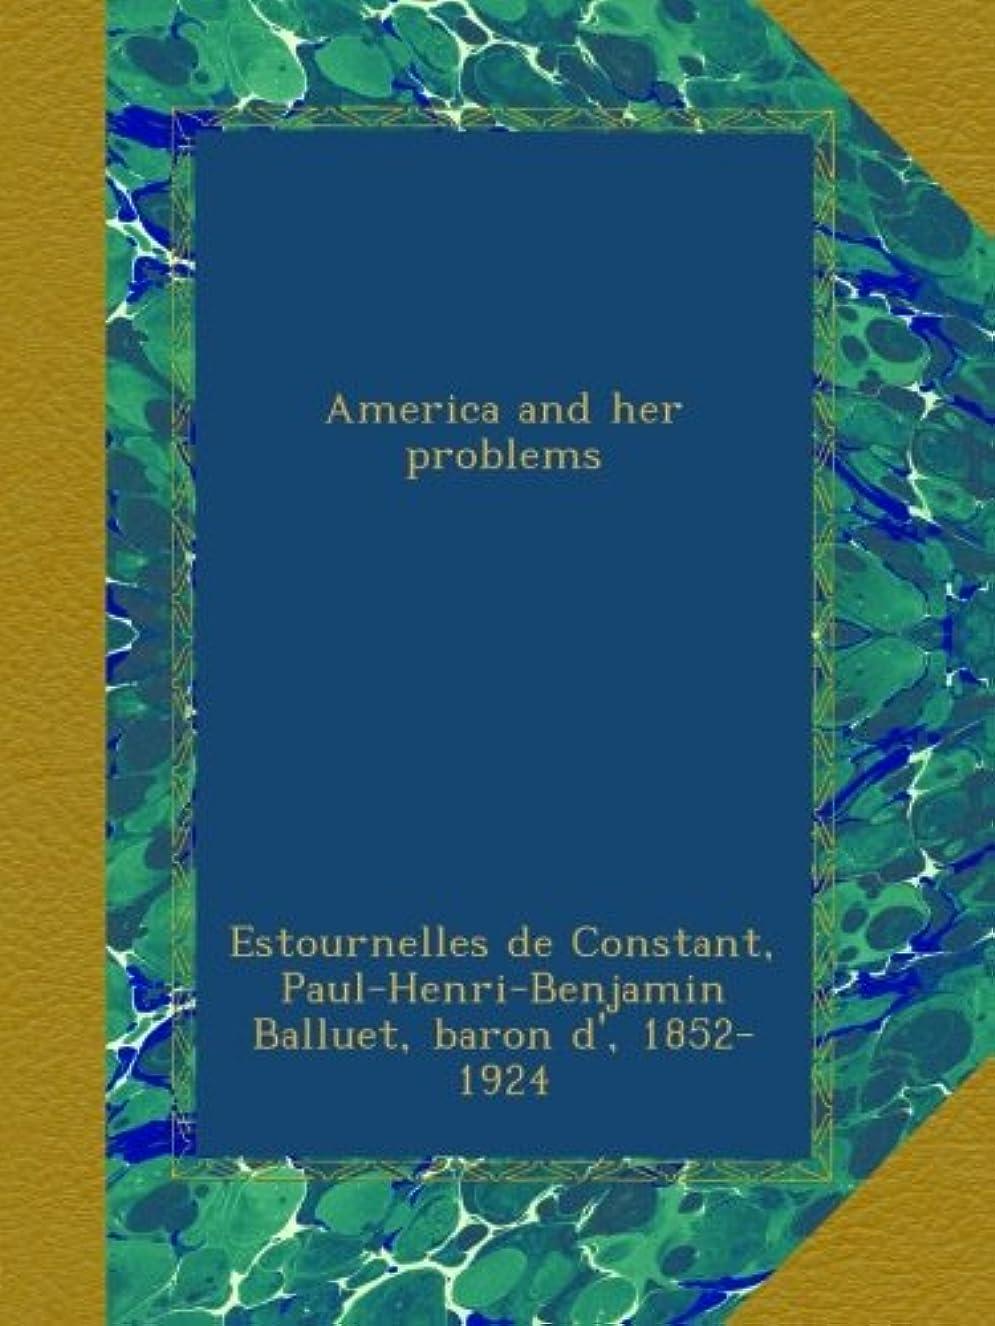 大使館大学院大腿America and her problems